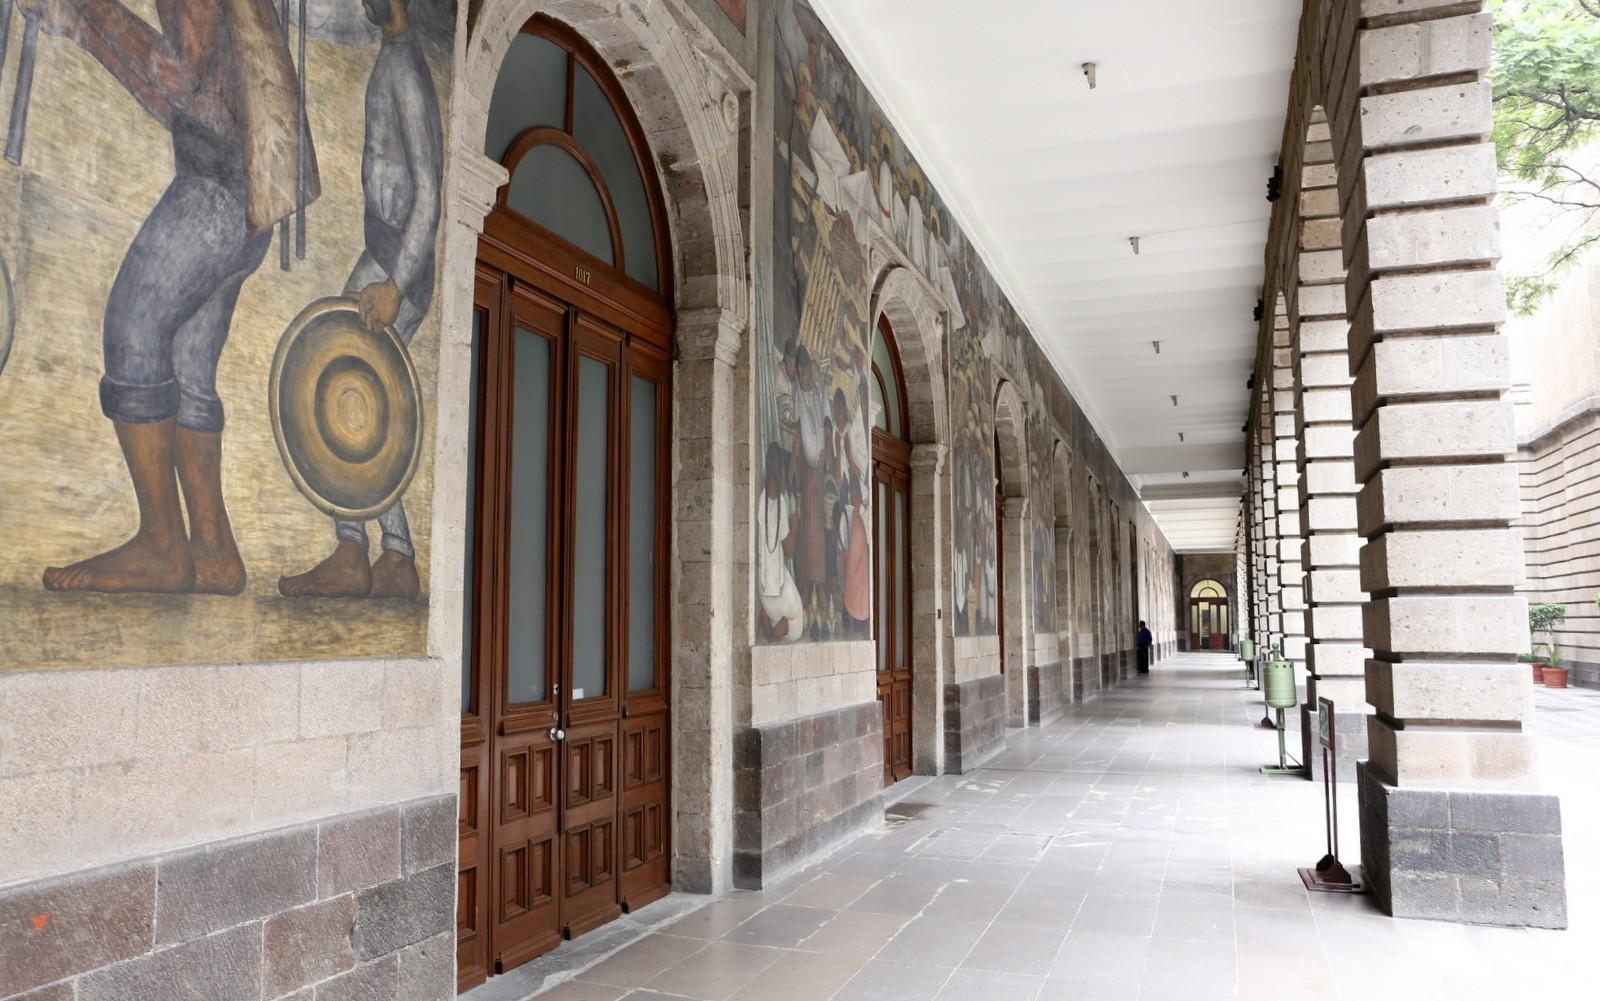 Diego Riveran muraaleja Meksiko